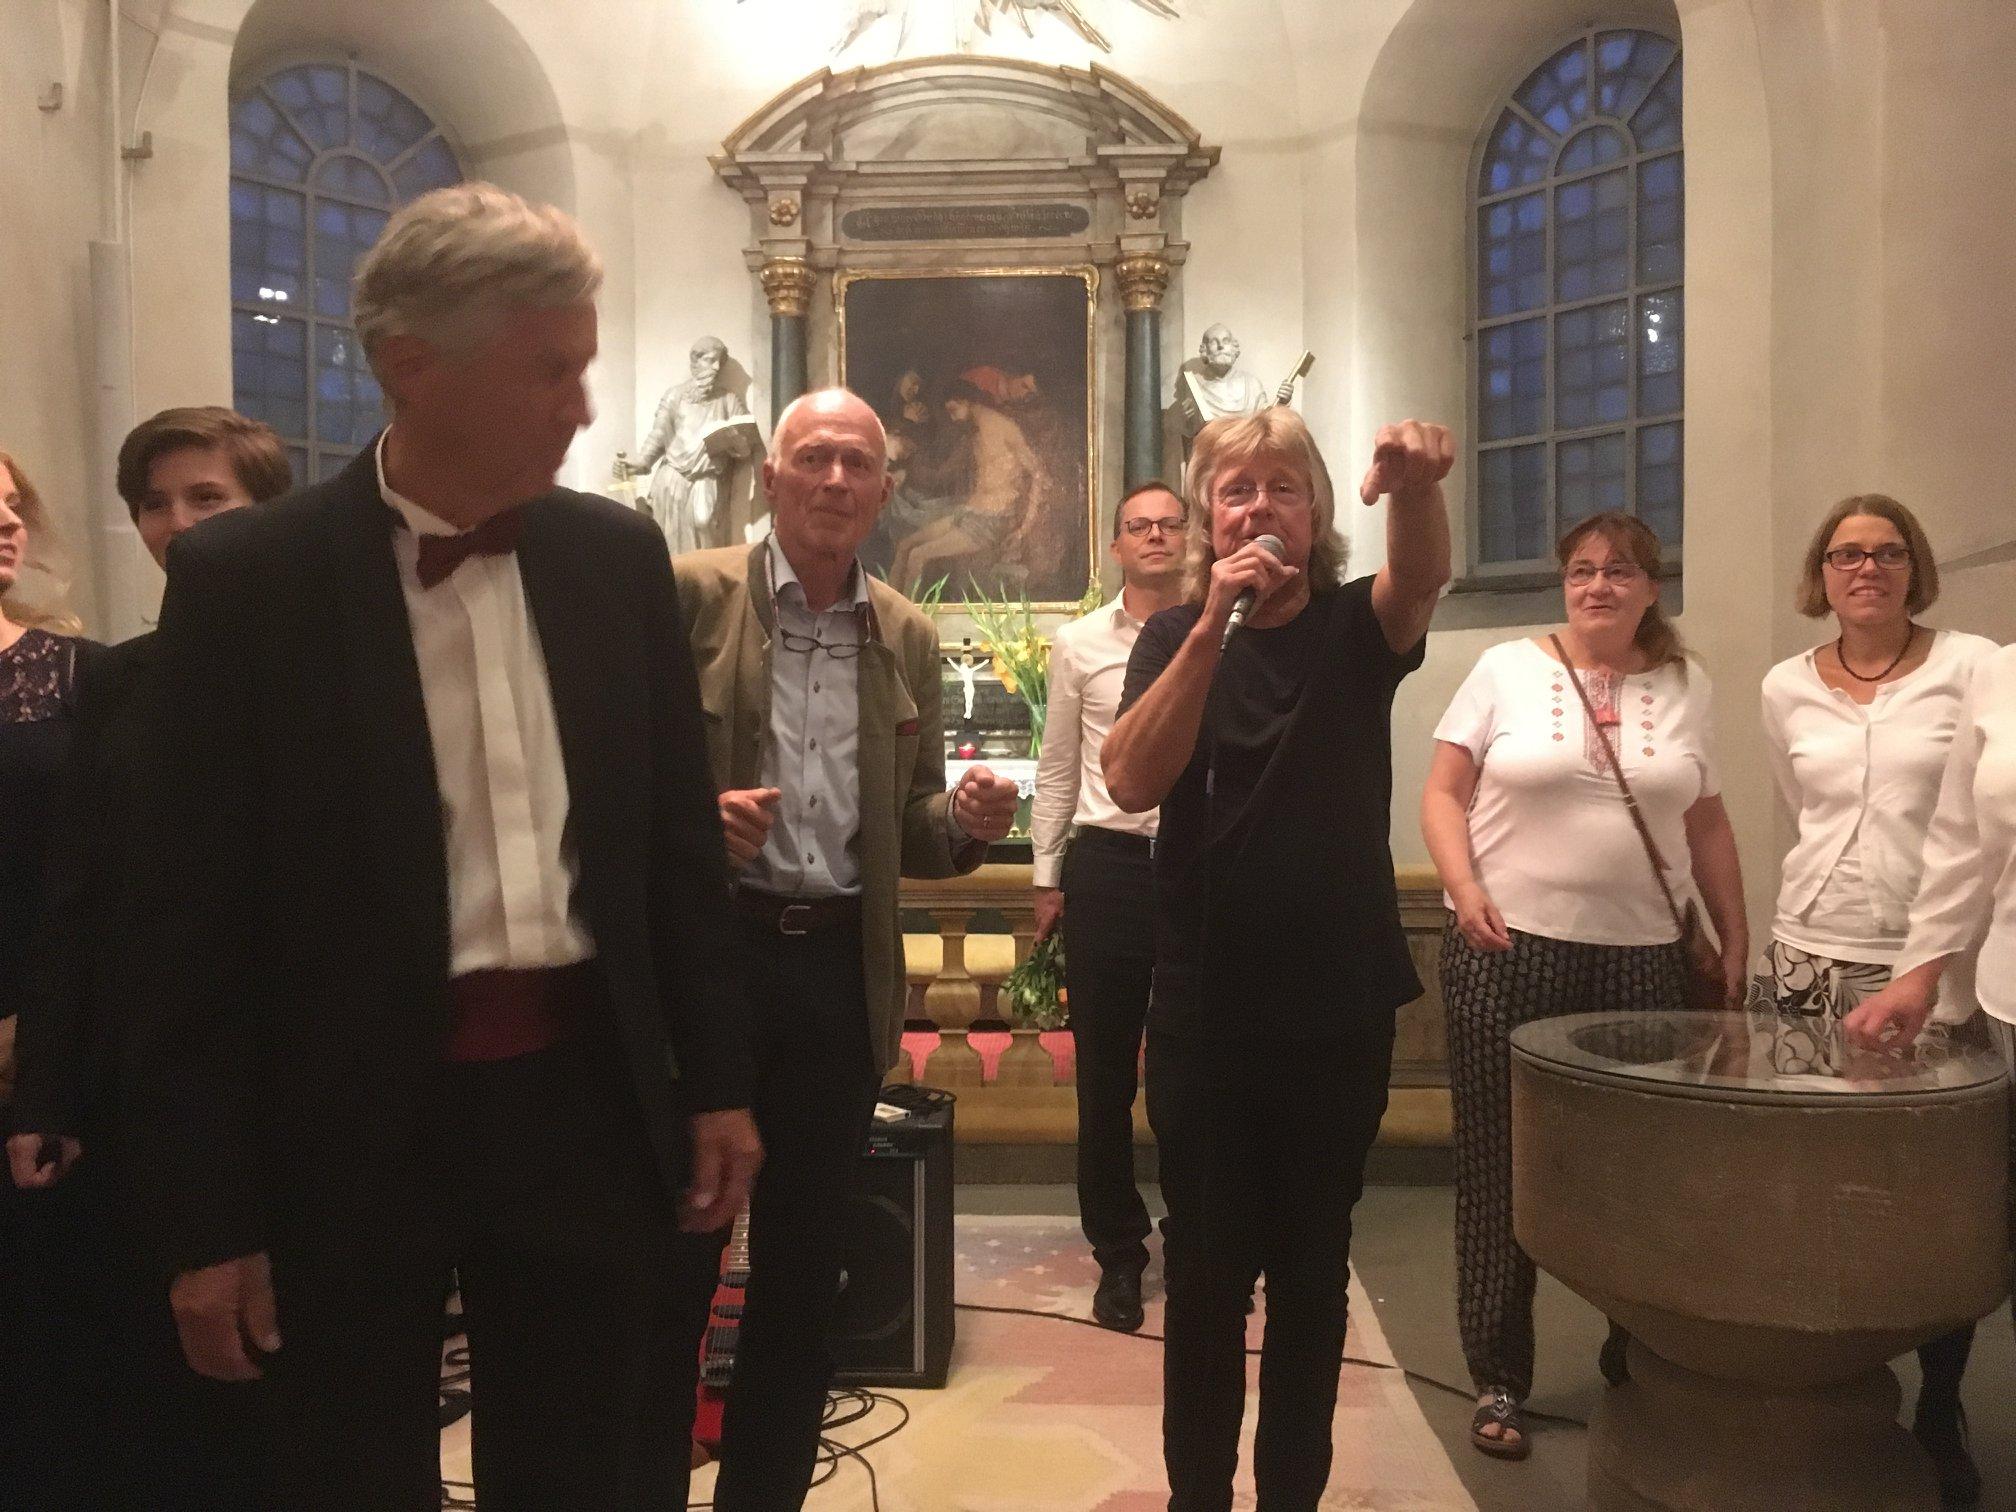 Janne Schaffer och kyrkokören